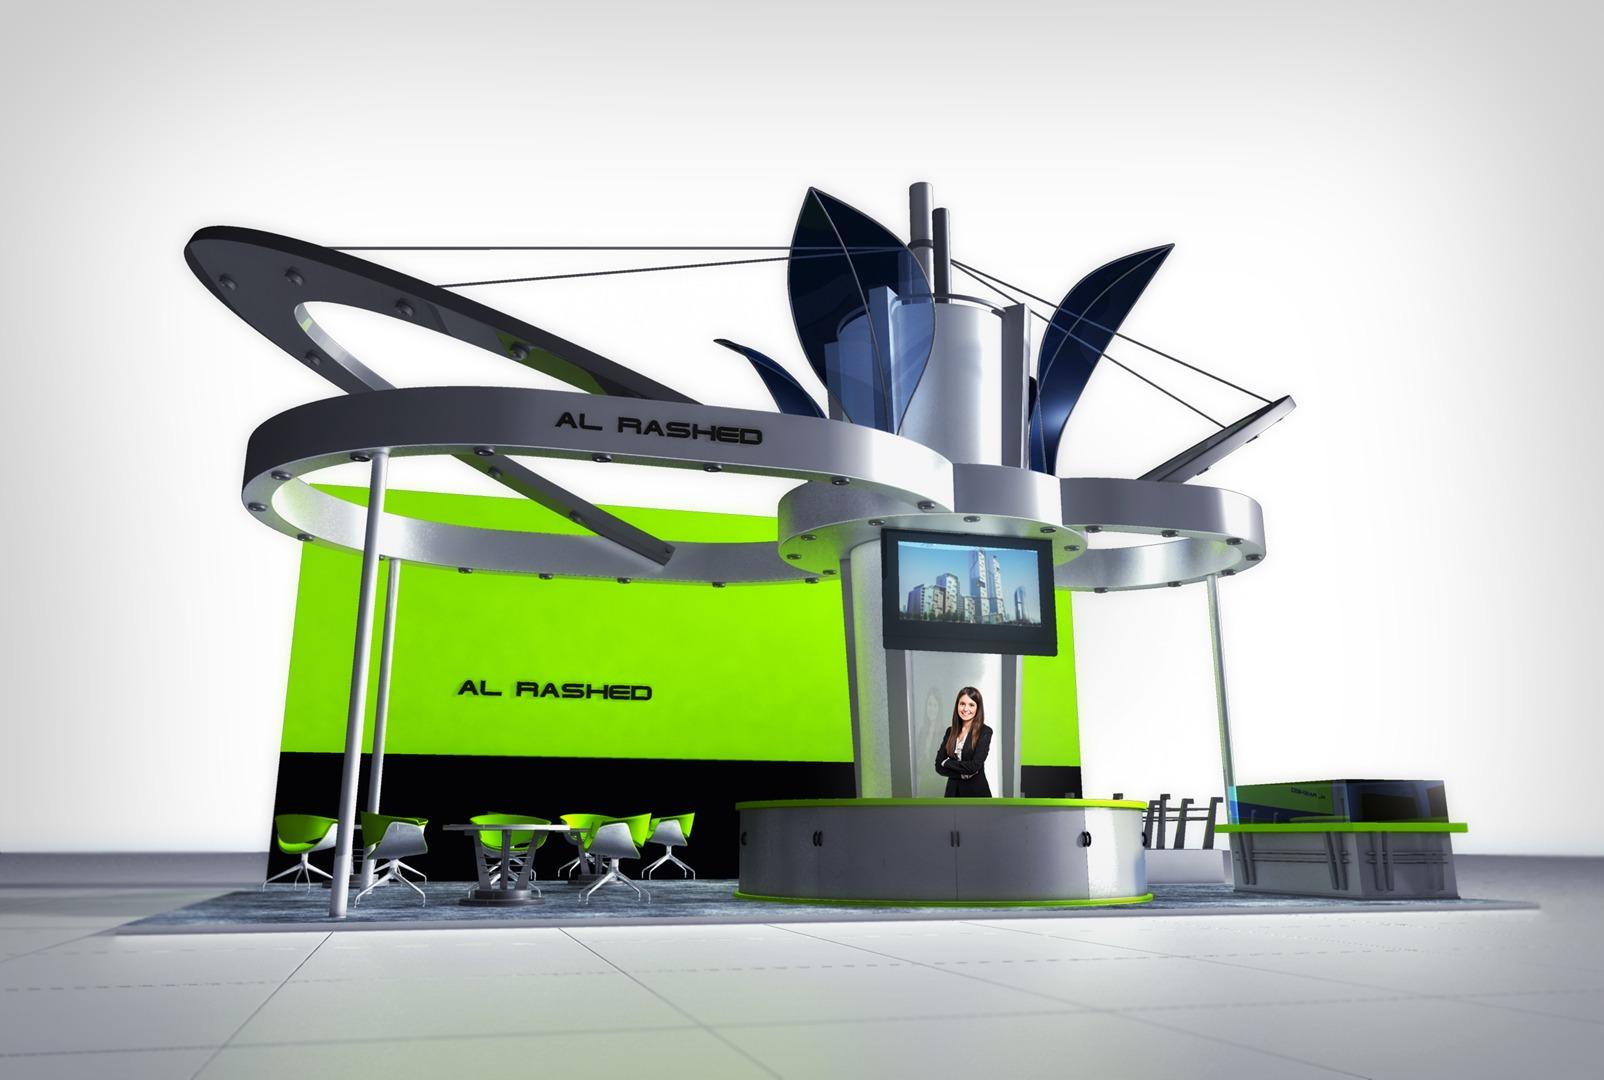 Advertising Agency in Dubai